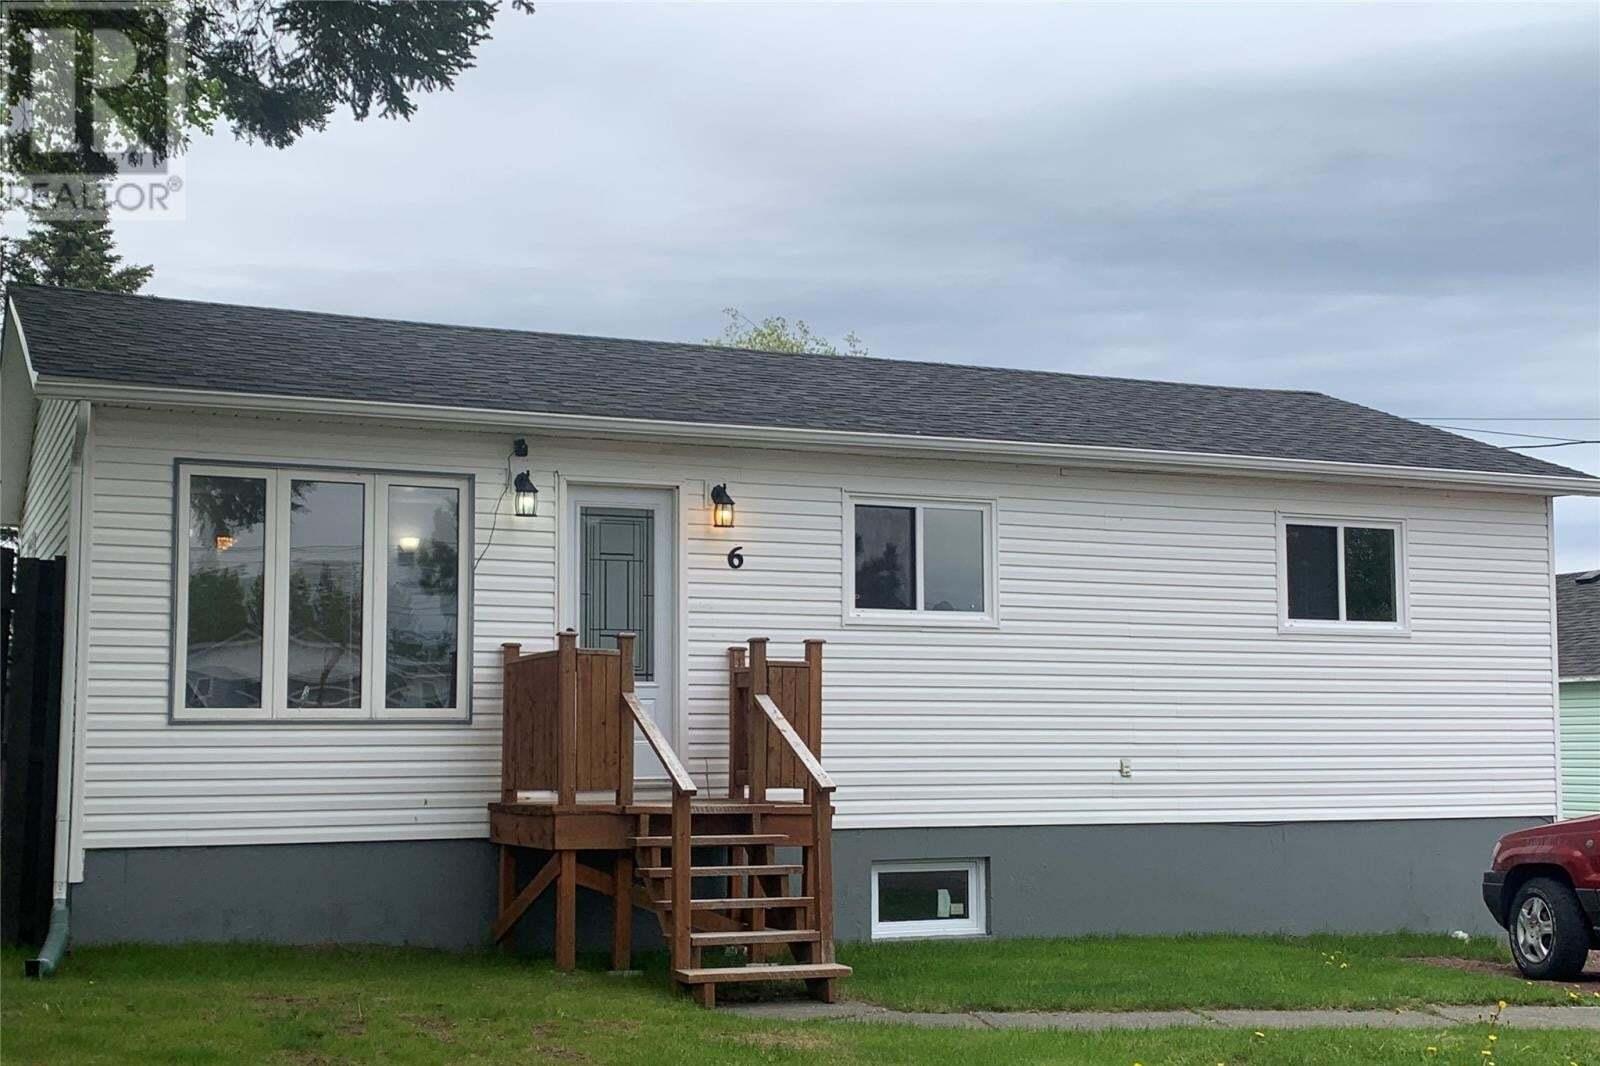 House for sale at 6 Sapling St Grand Falls - Windsor Newfoundland - MLS: 1212320